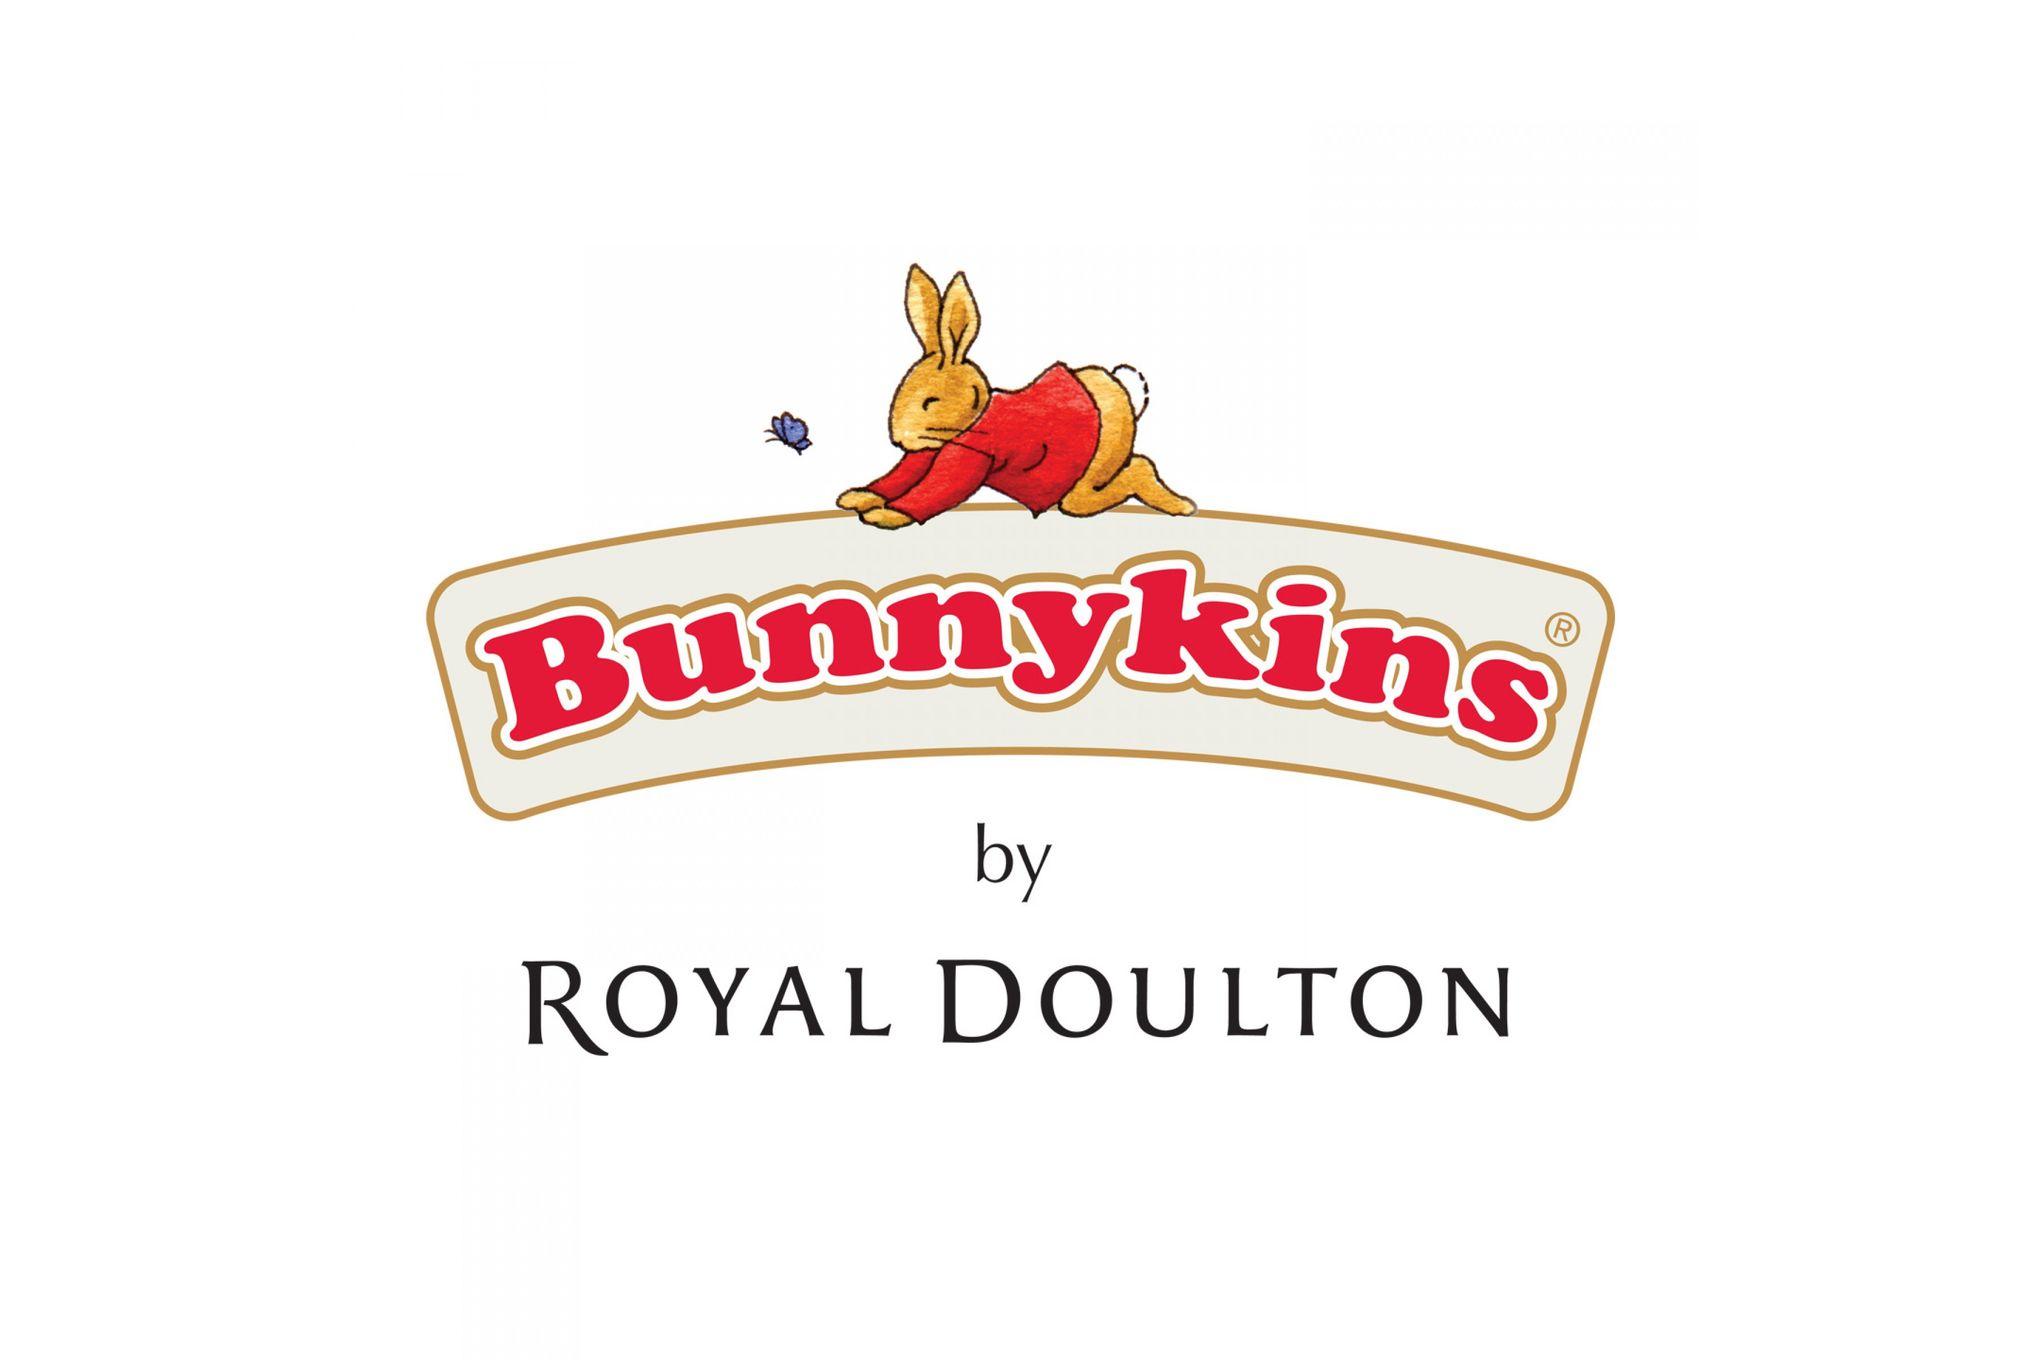 Royal Doulton Bunnykins Egg Cup Designs Vary thumb 2